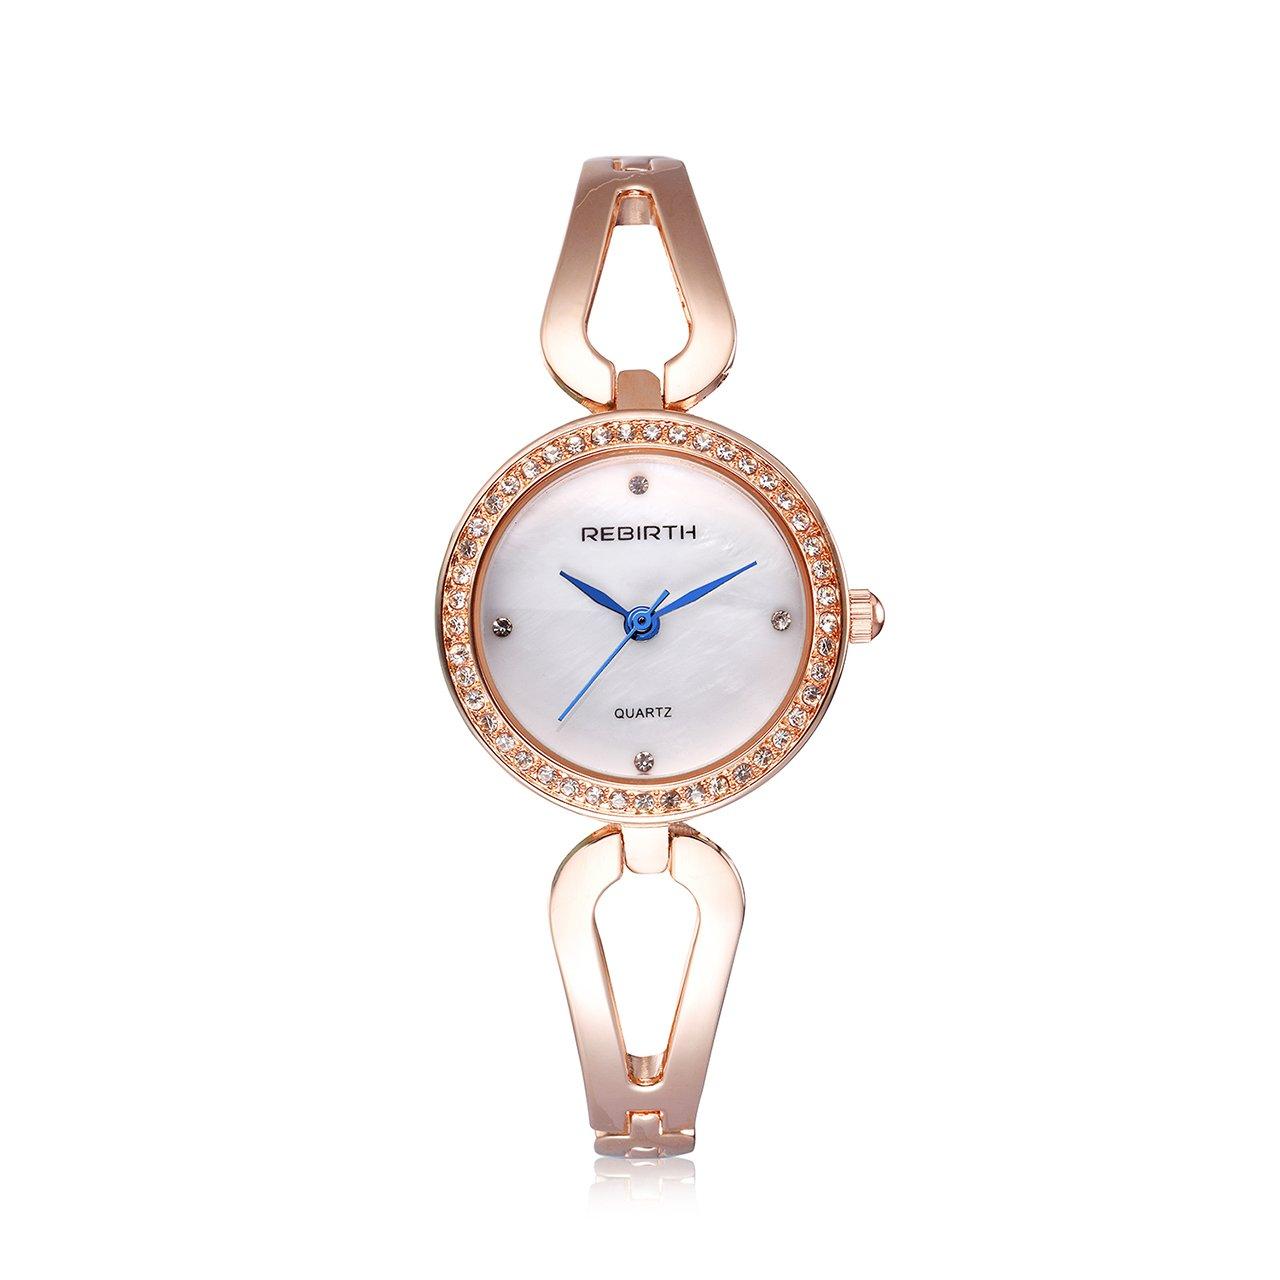 Top Plaza Women Ladies Elegant Luxury Alloy Bracelet Wristwatch Japanese Movement Rhinestones Decorated 30M Waterproof Analog Quartz Cuff Watch - Valentine's Day Gift(Rose Gold)